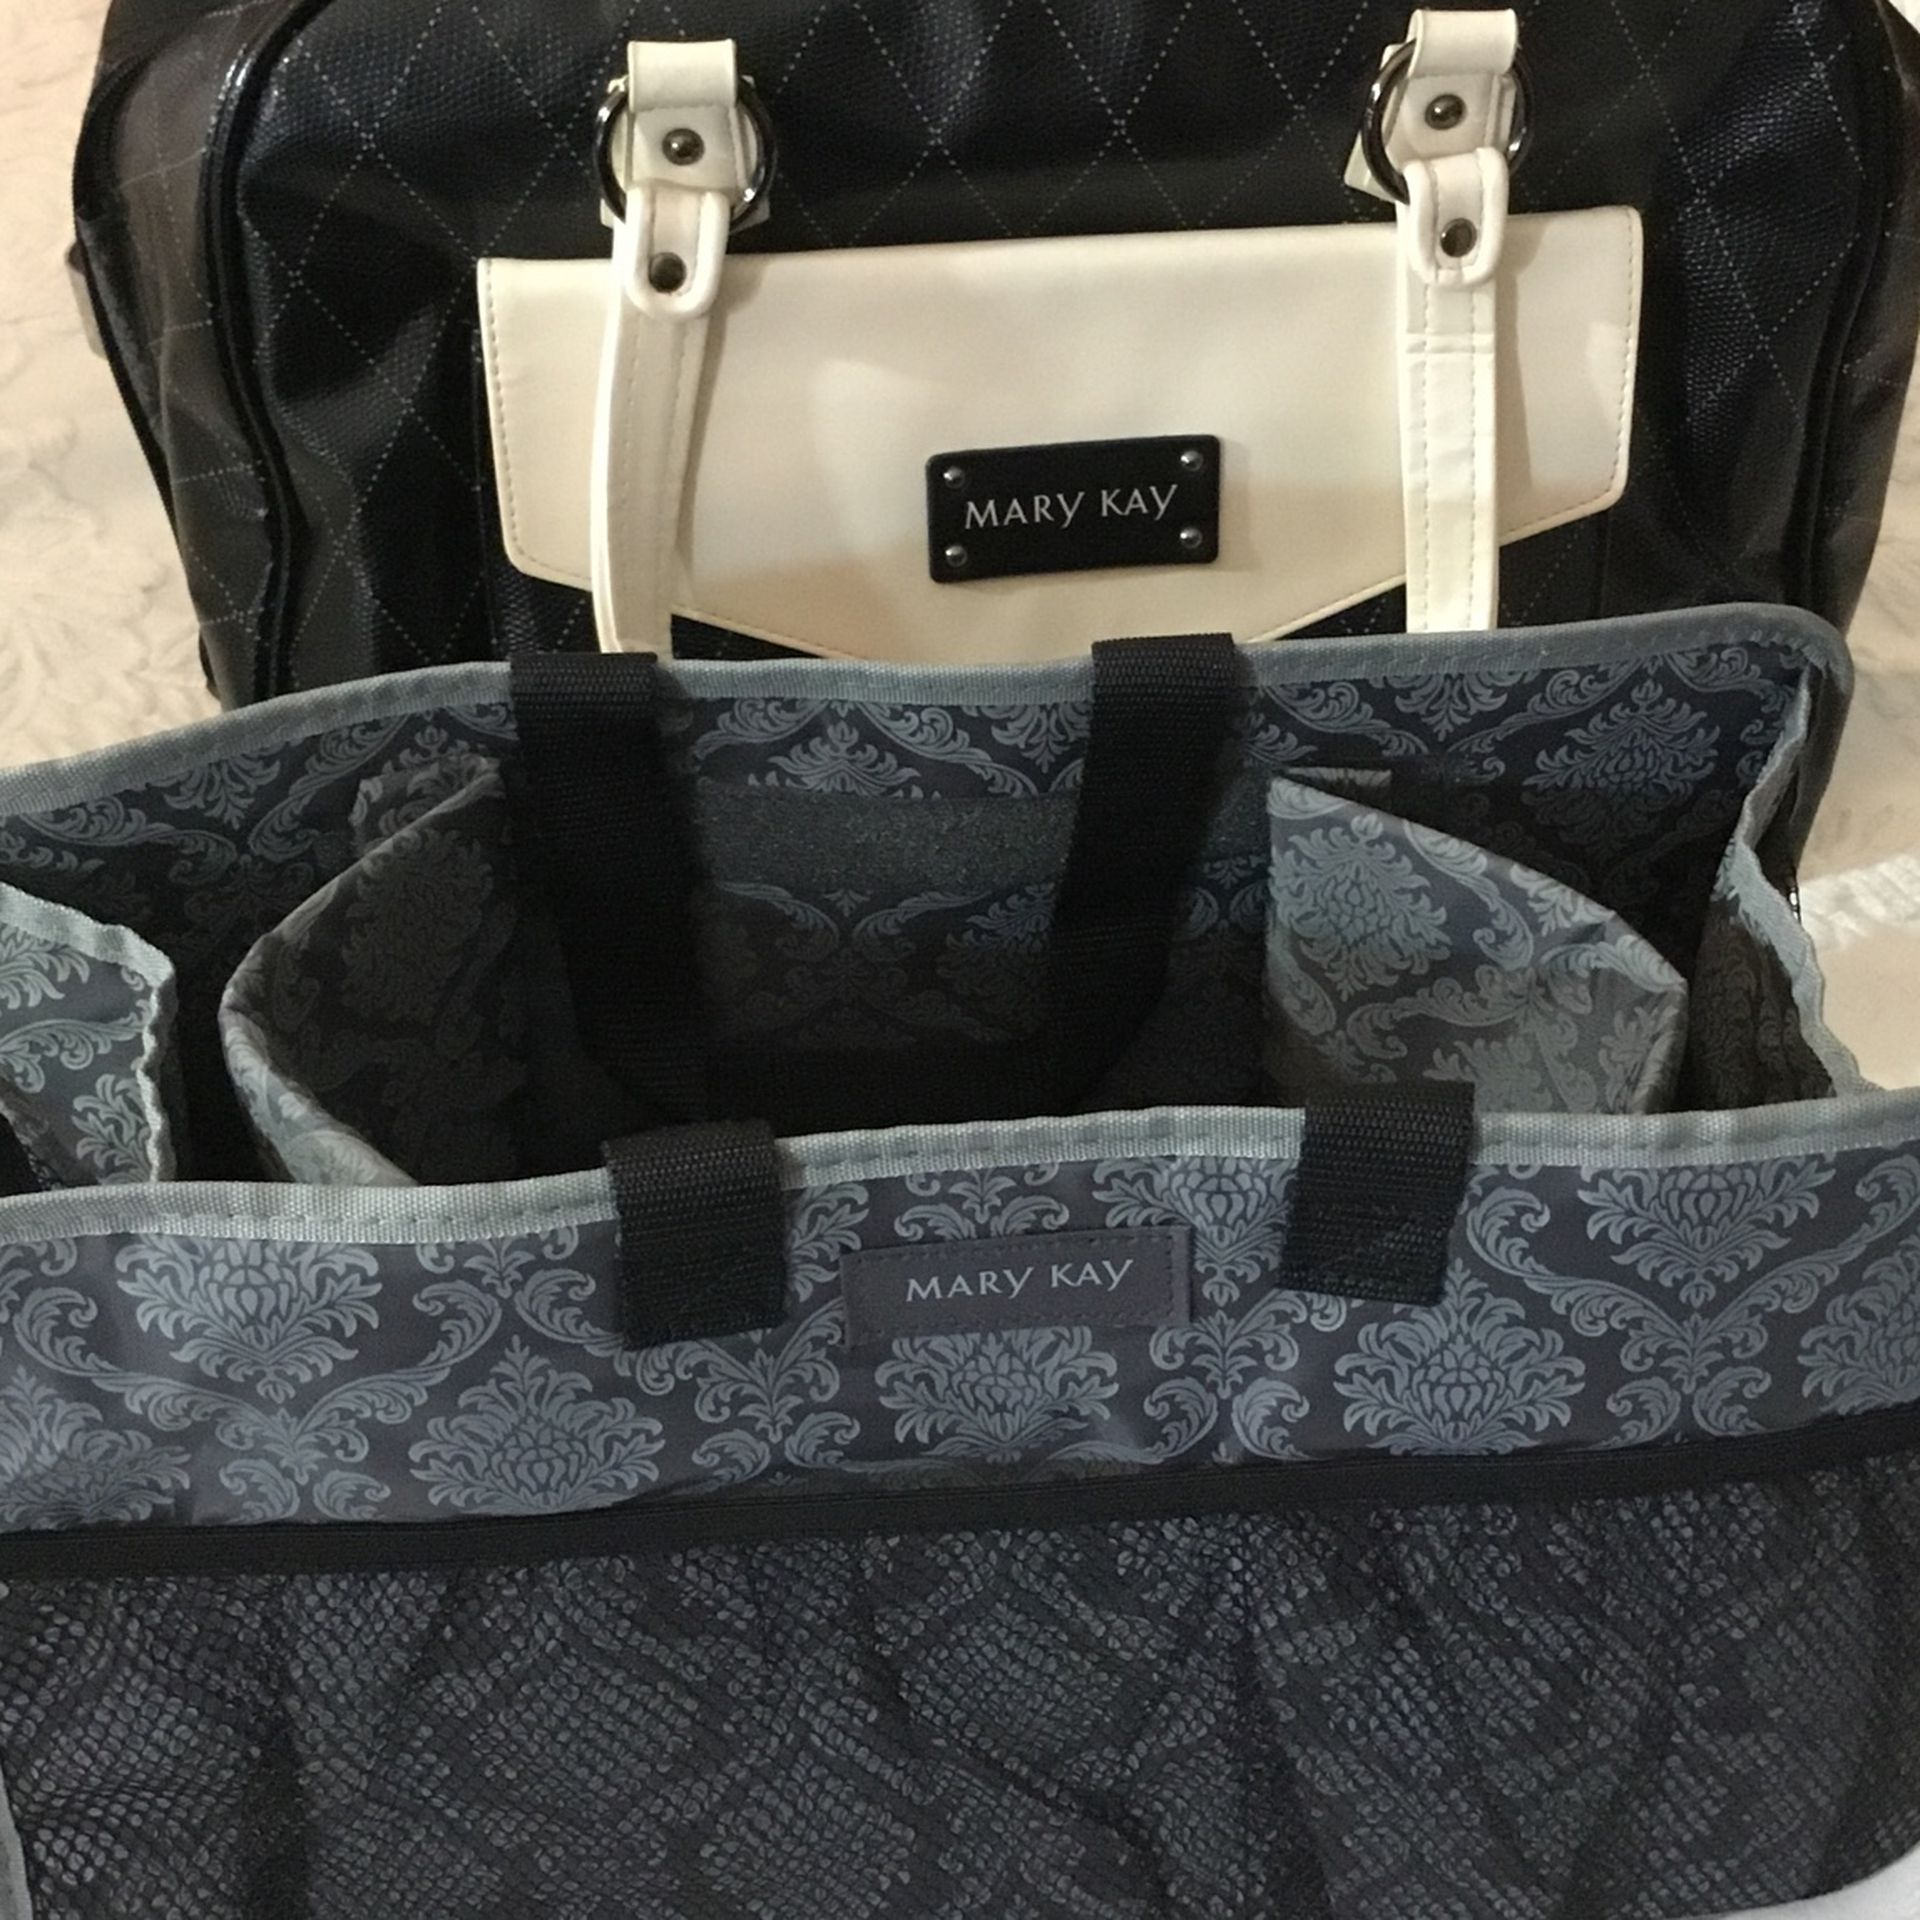 Mary Kay Organizer Bag